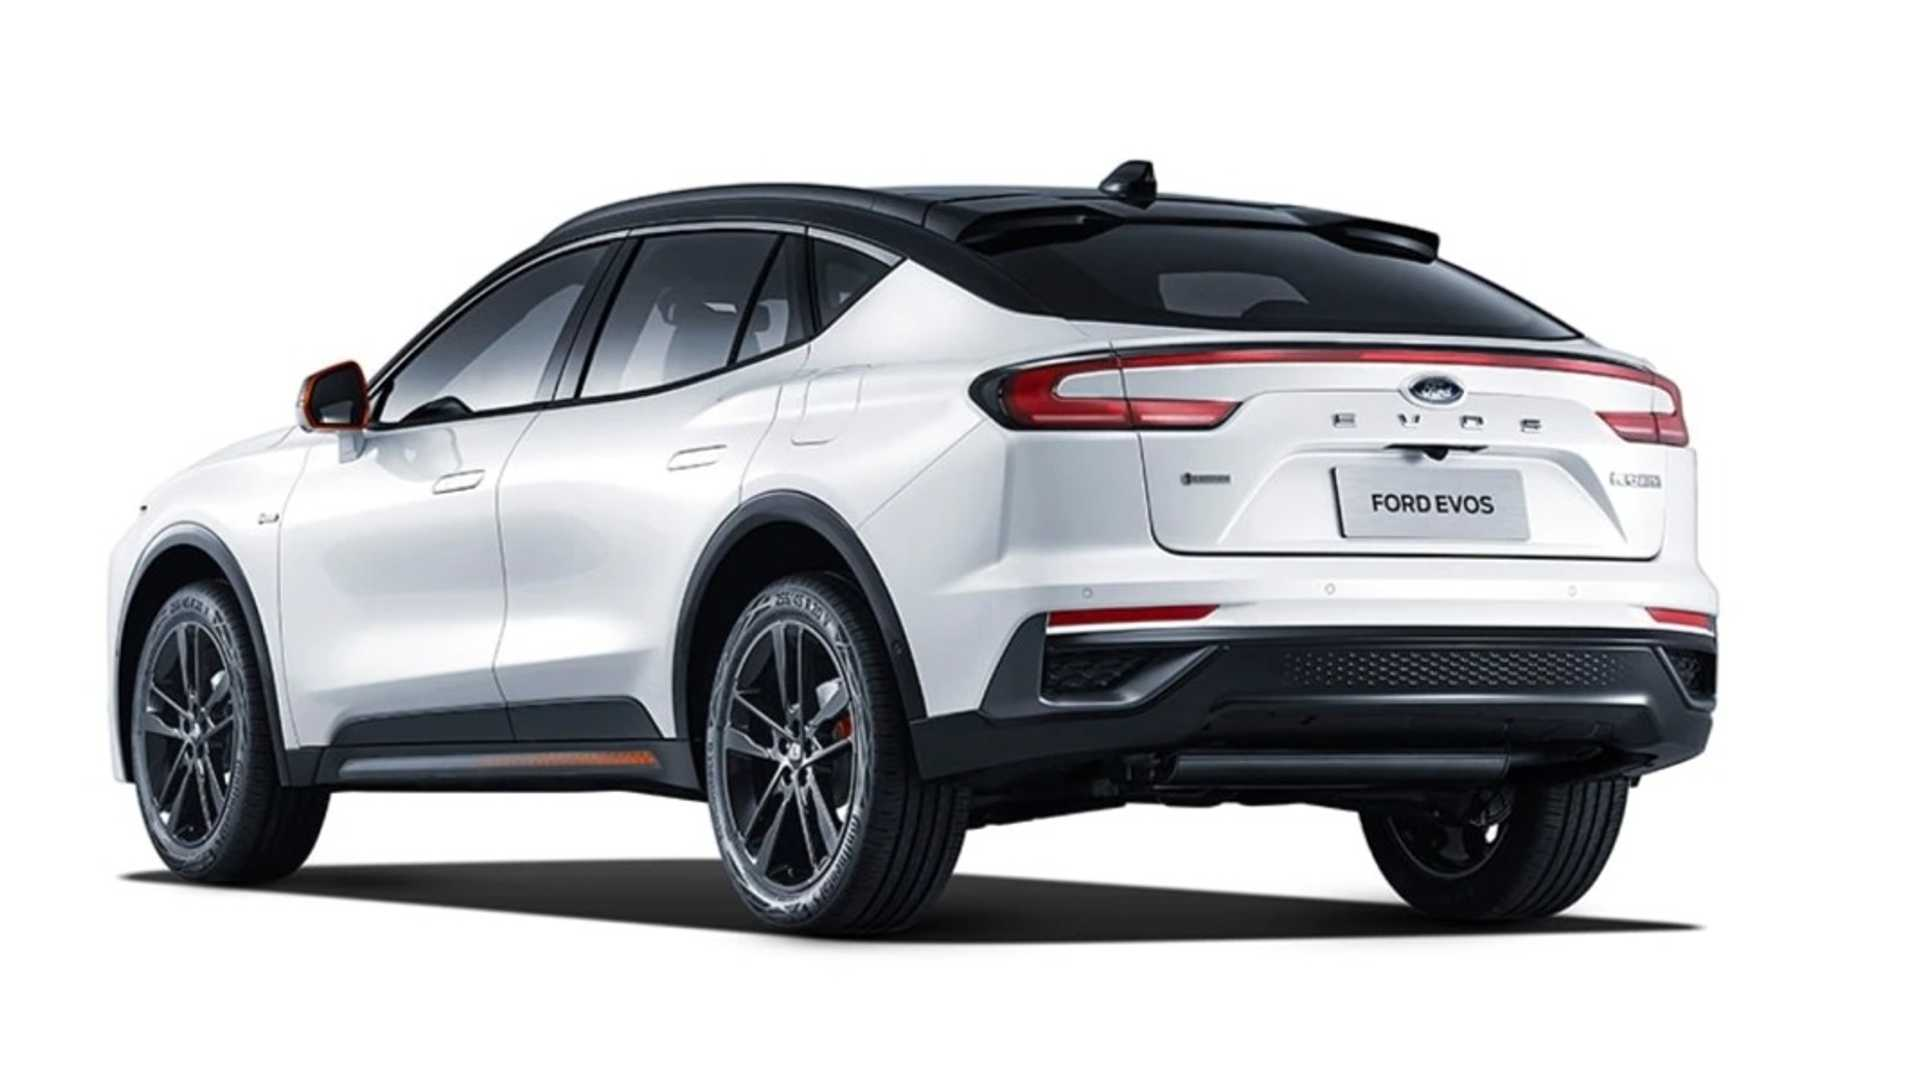 Ford-Evos-2021-3